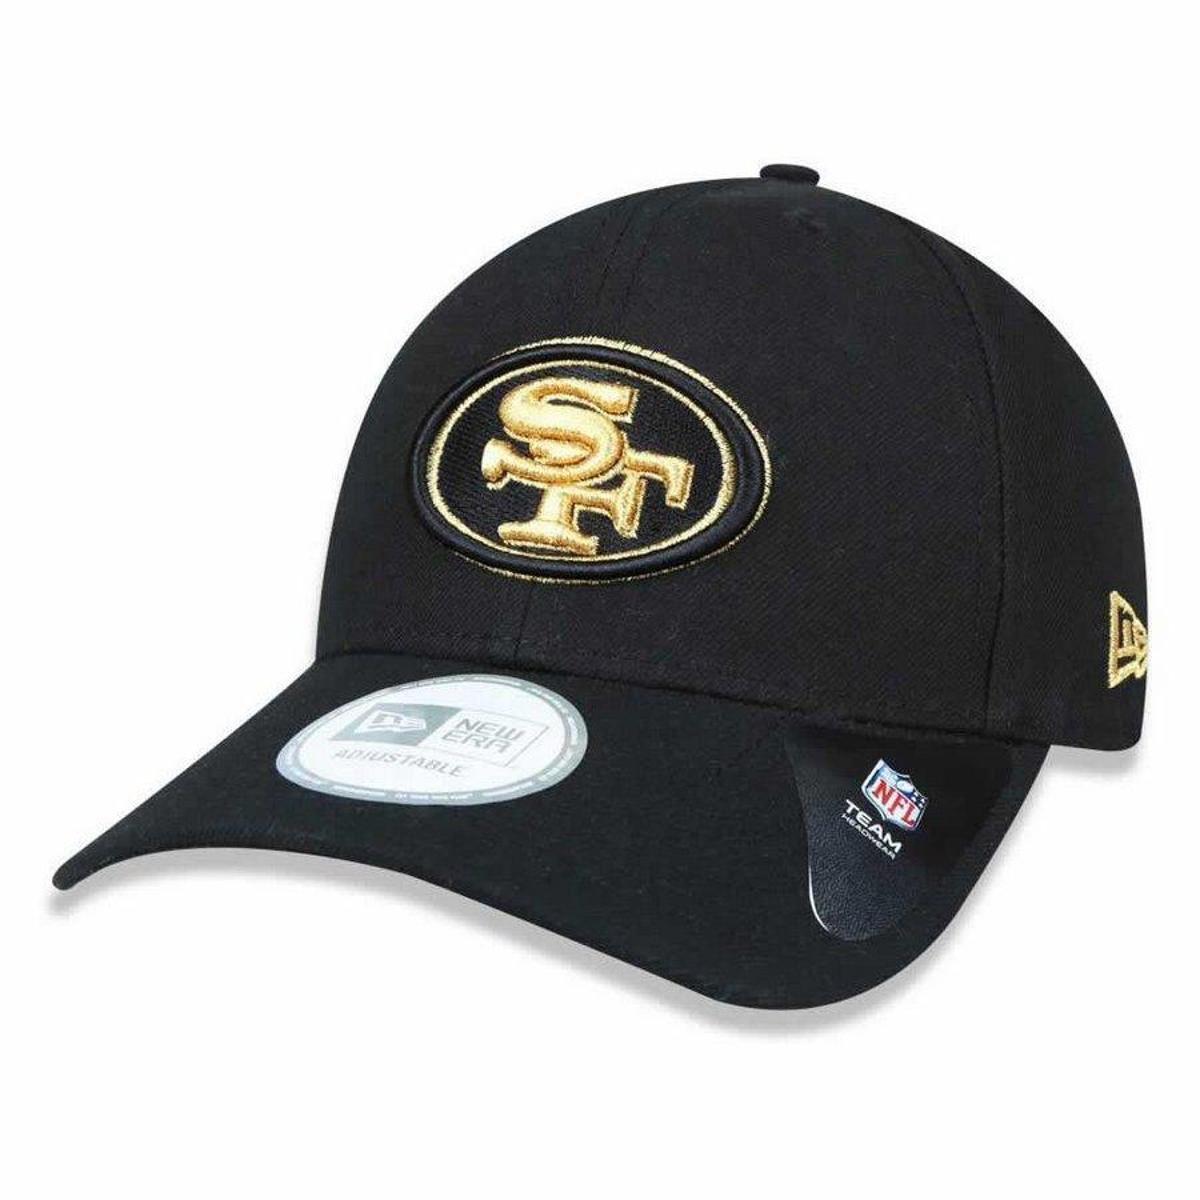 Boné San Francisco 49ers Snapback Gold on Black - New Era - Compre ... 93ee1c64189